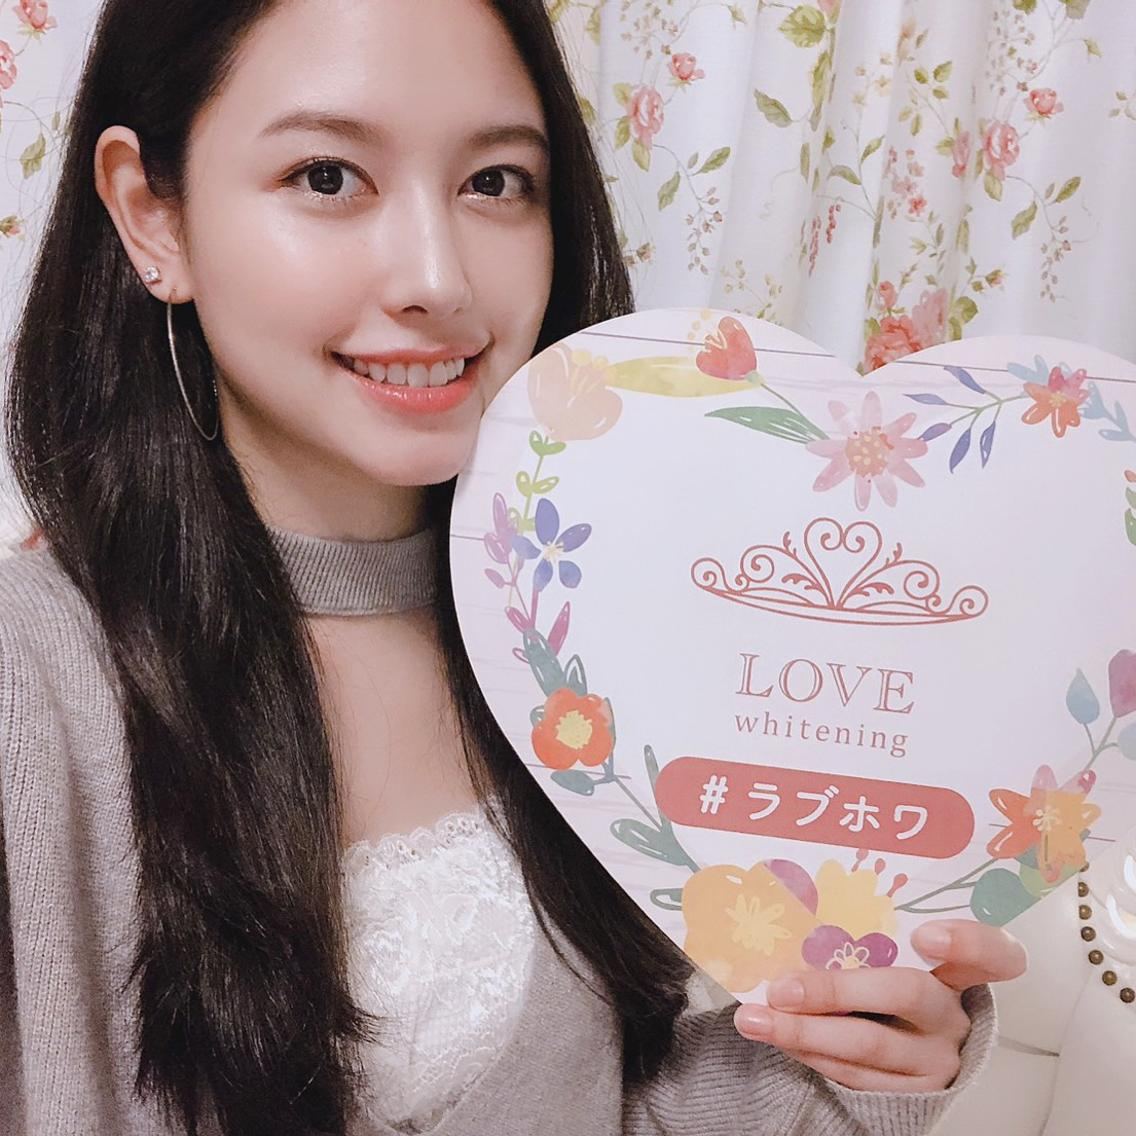 LOVEホワイトニング池袋店所属・💖LOVE ホワイトニング💖の掲載